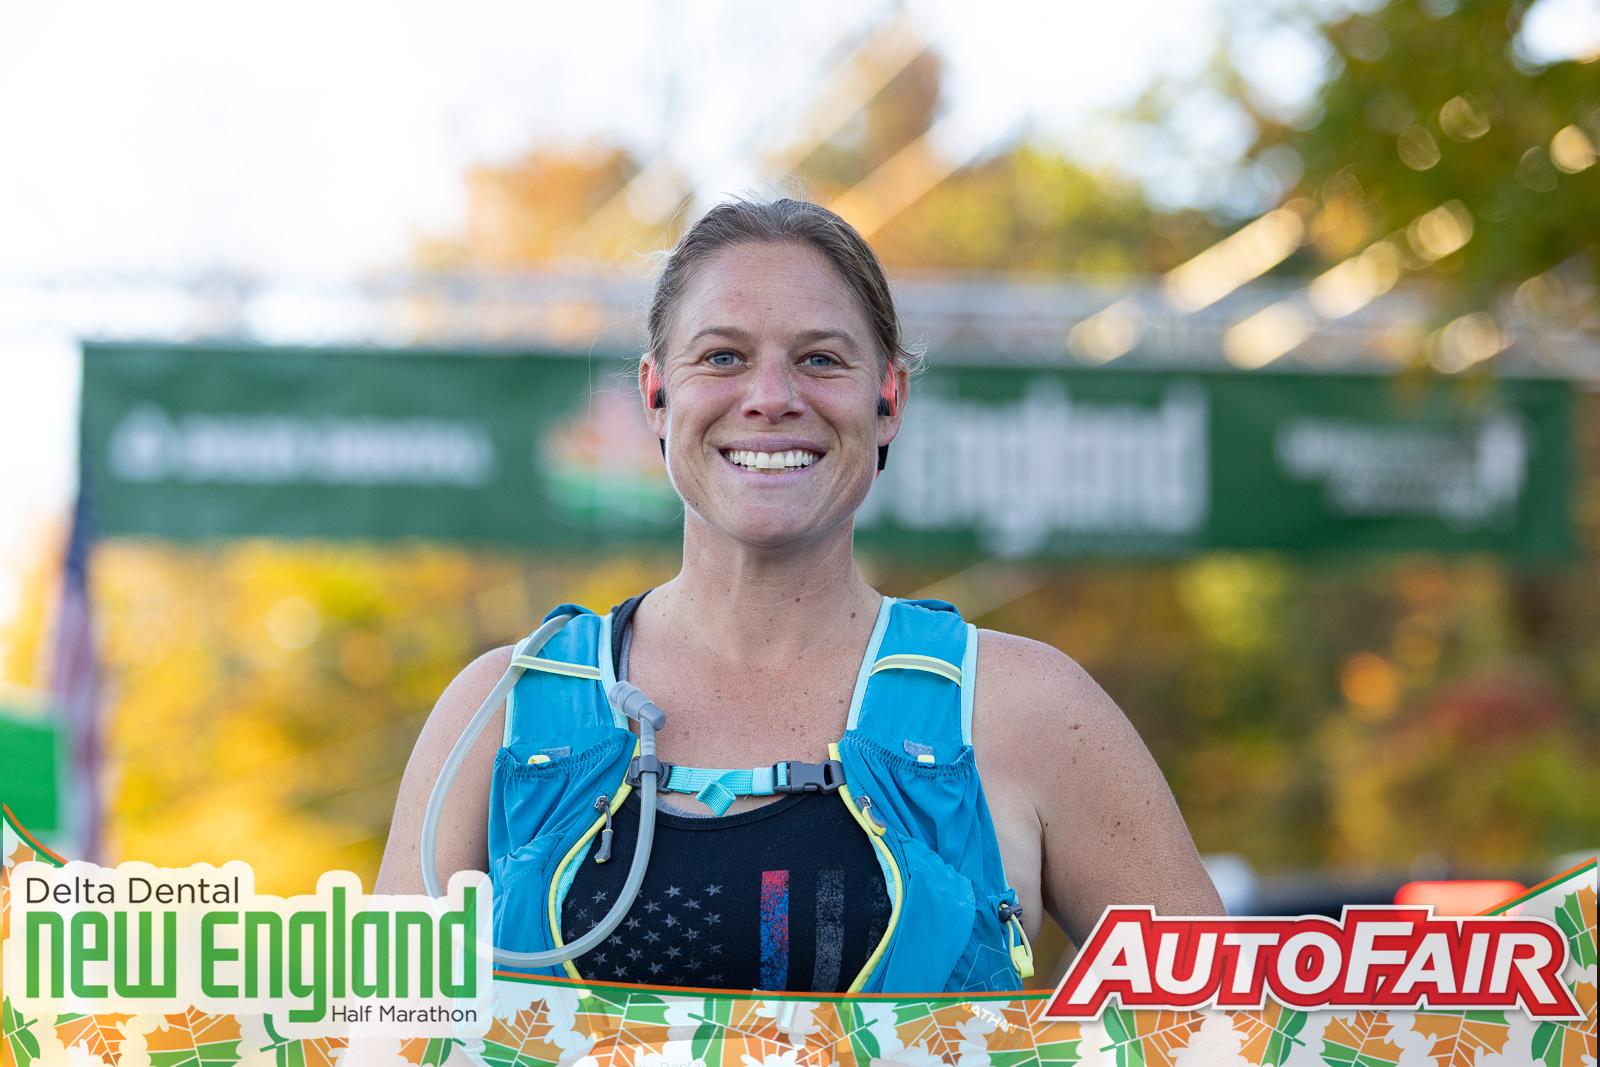 PHOTOS: Delta Dental New England Half Marathon – 2021